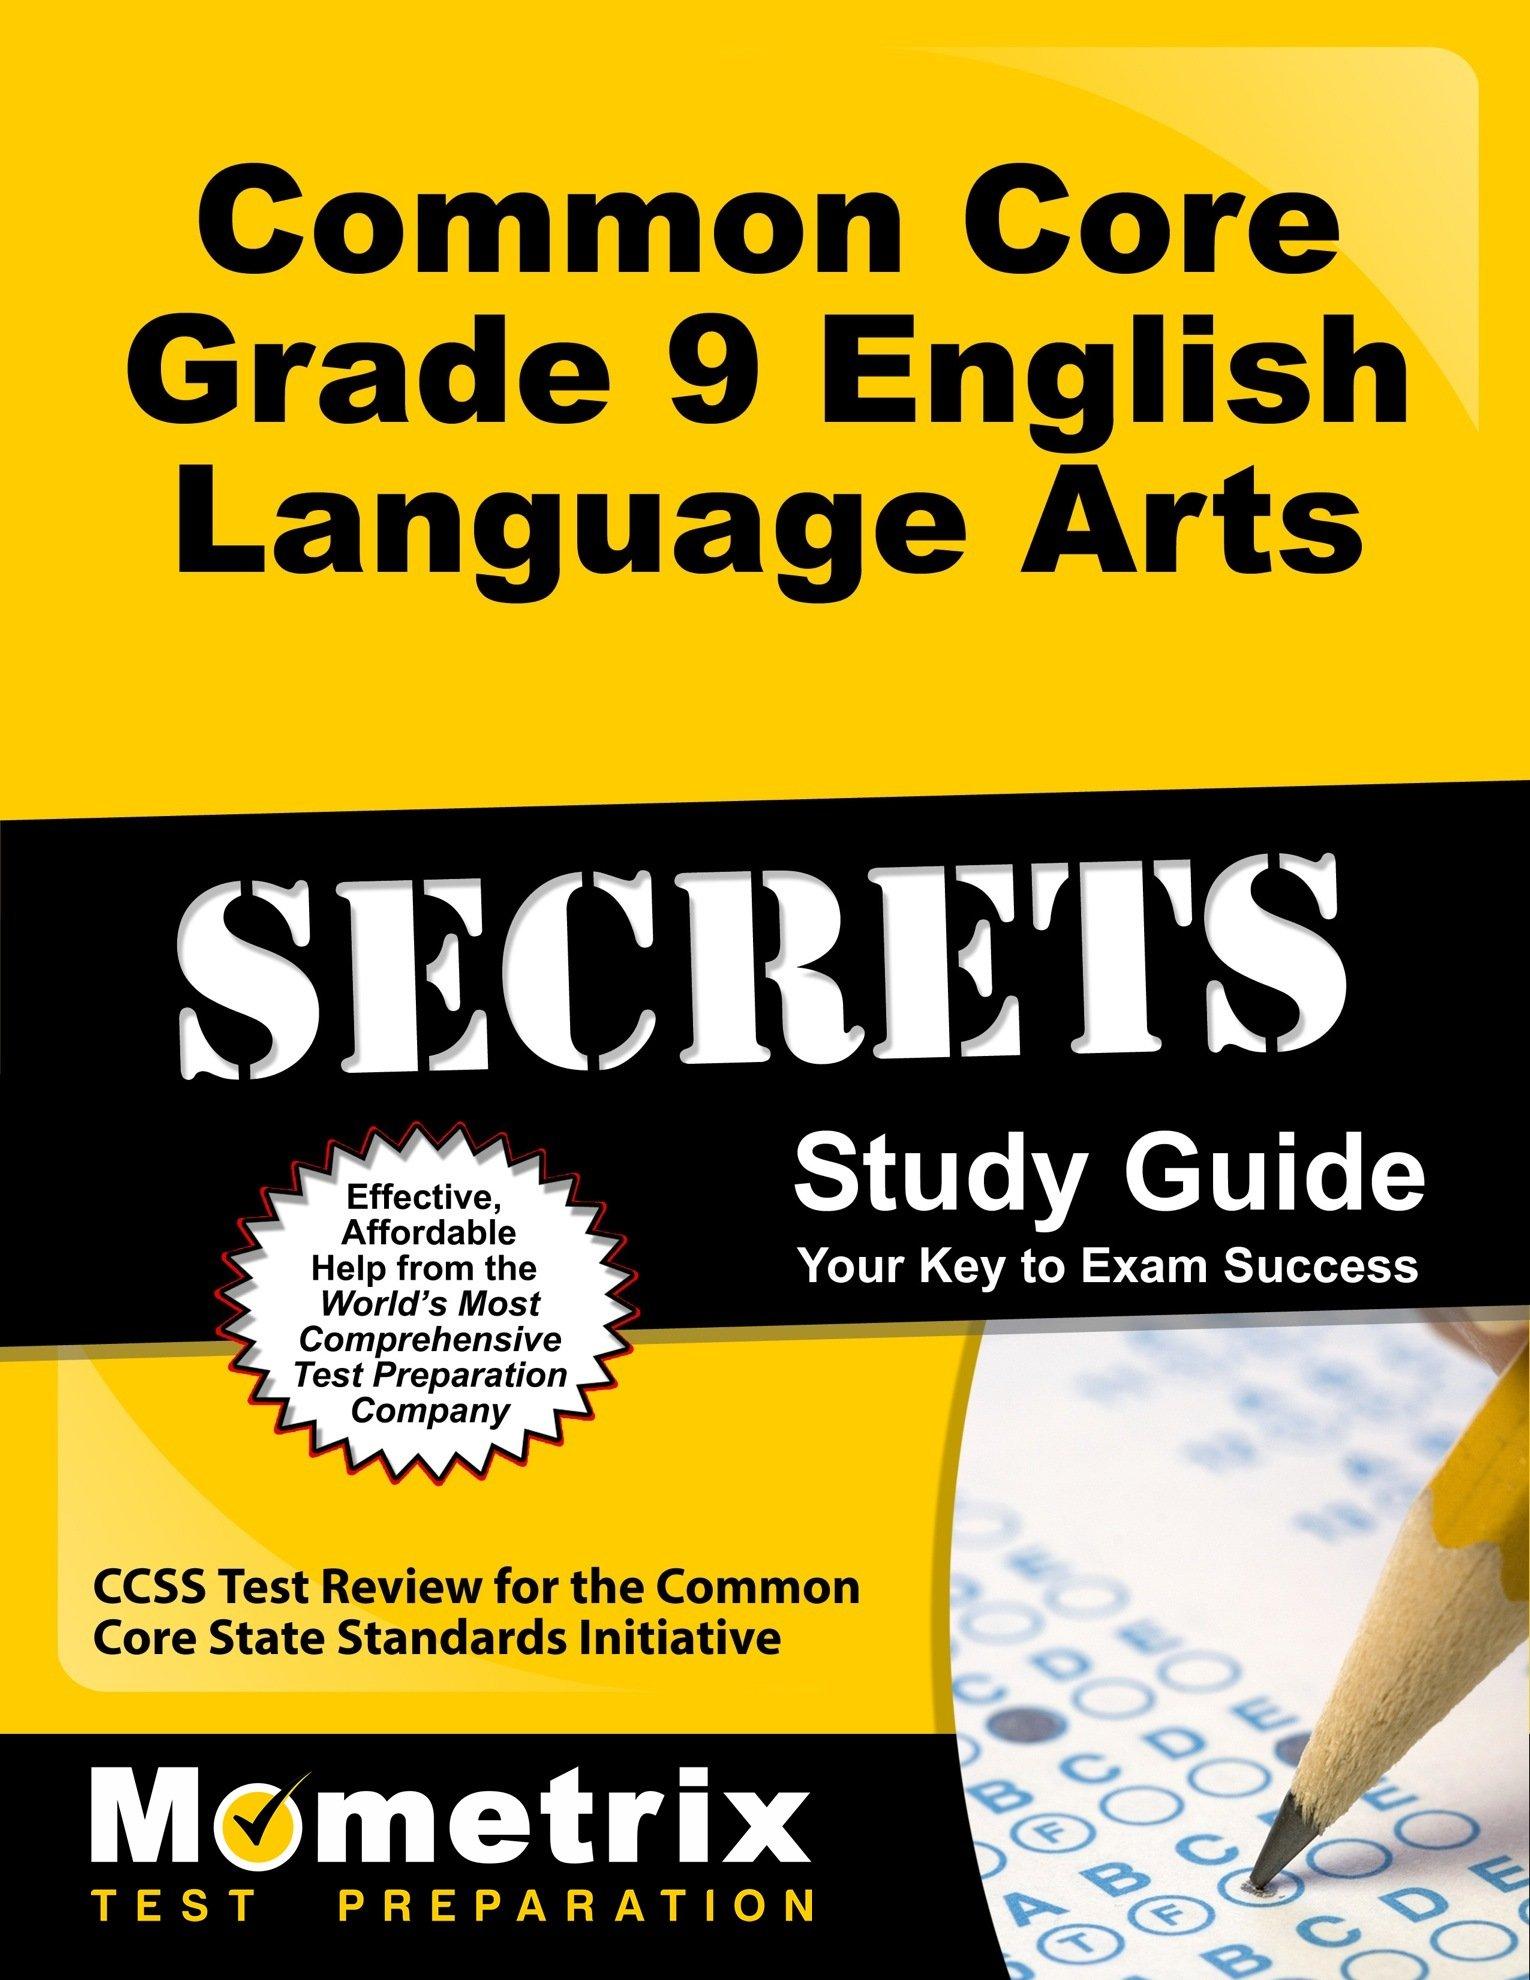 Common Core Grade 9 English Language Arts Secrets Study